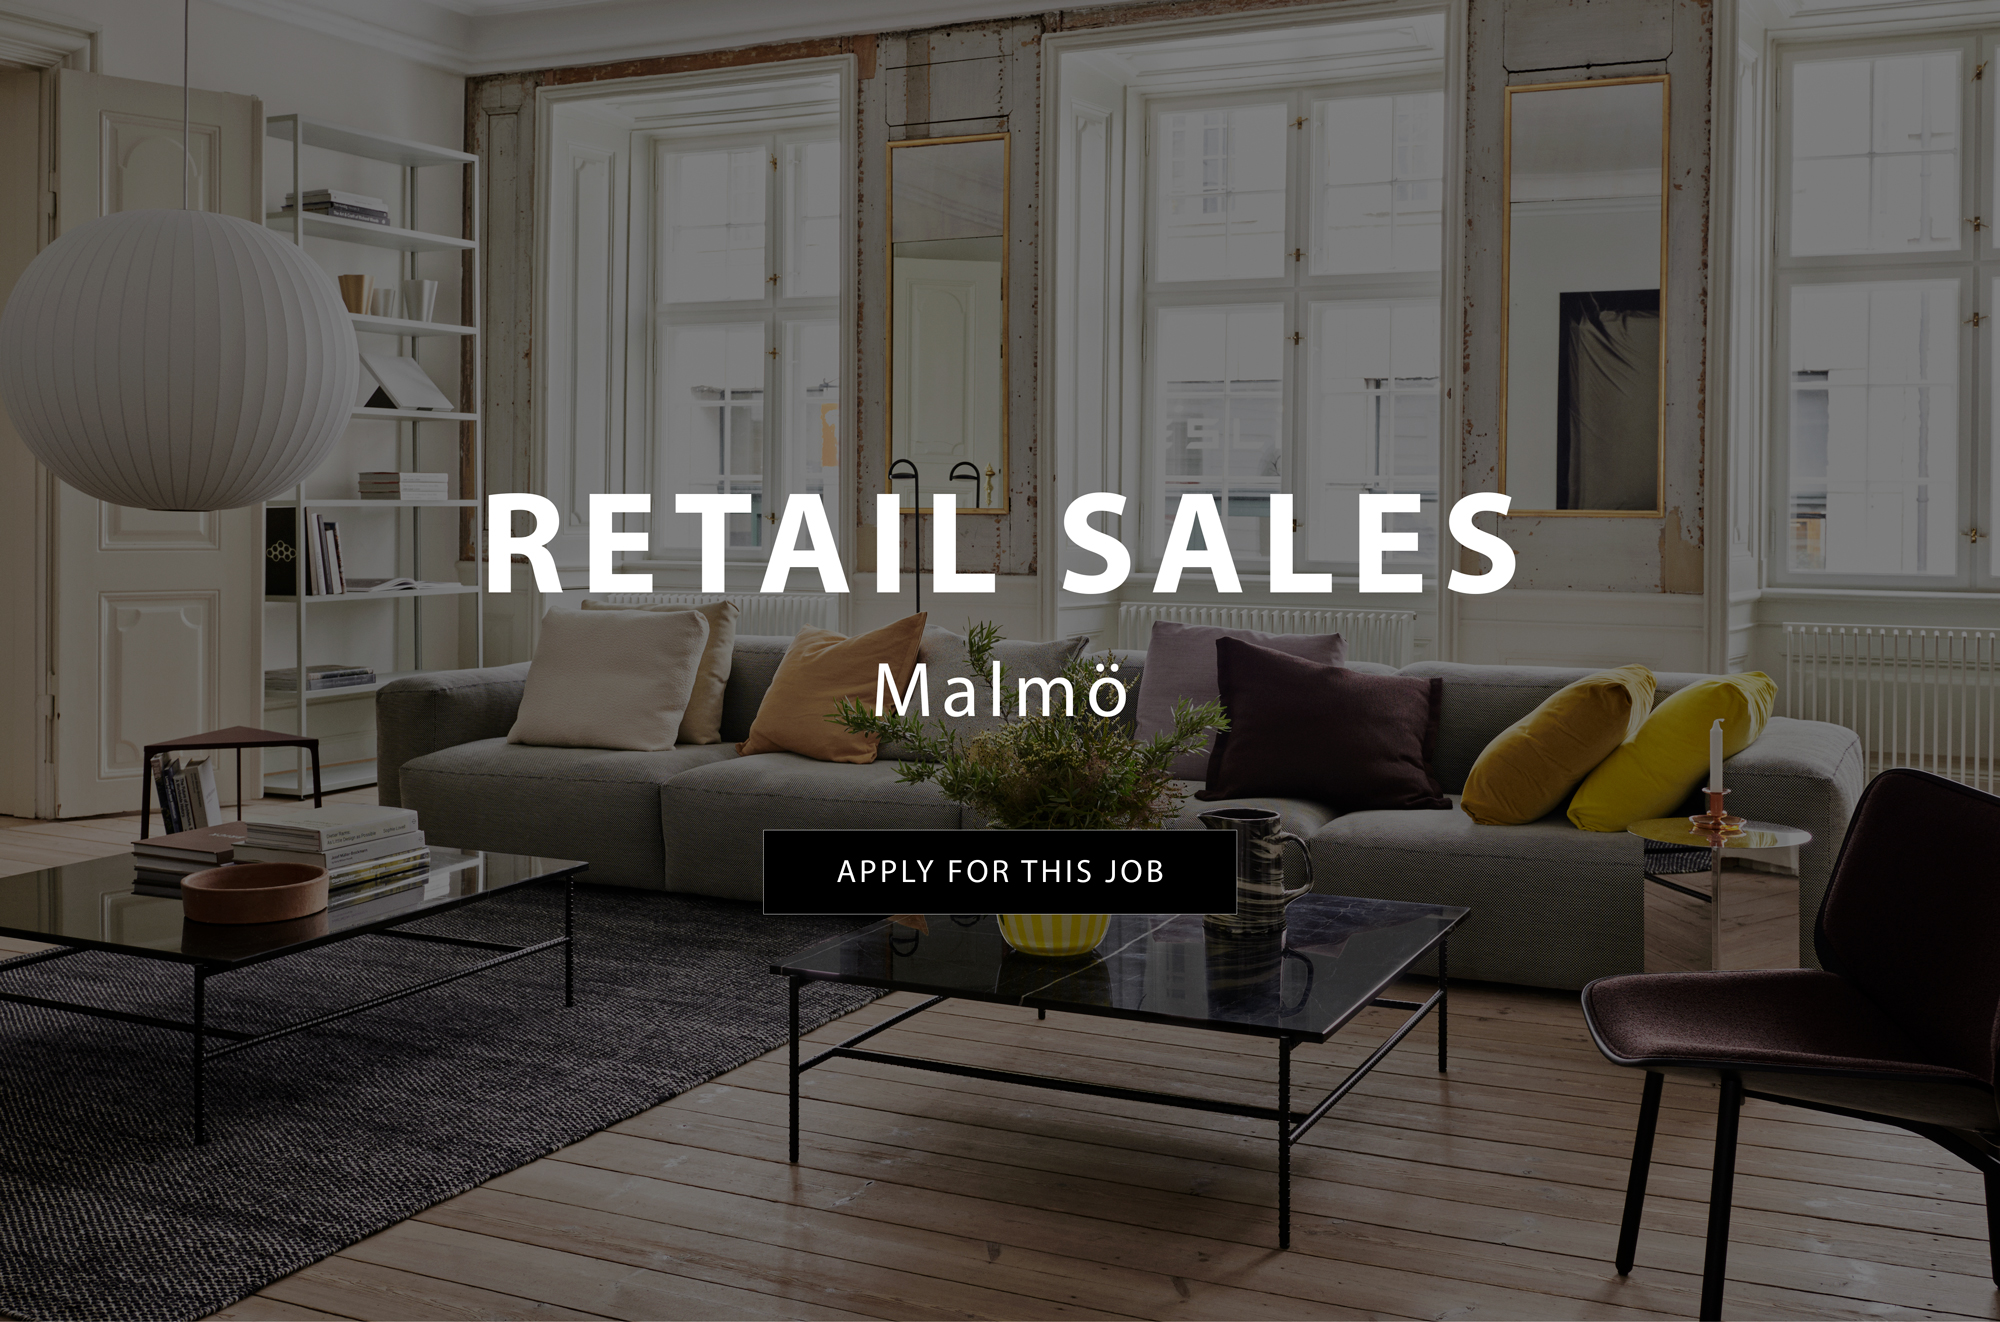 Gulled söker personal – Retail Sales Malmö